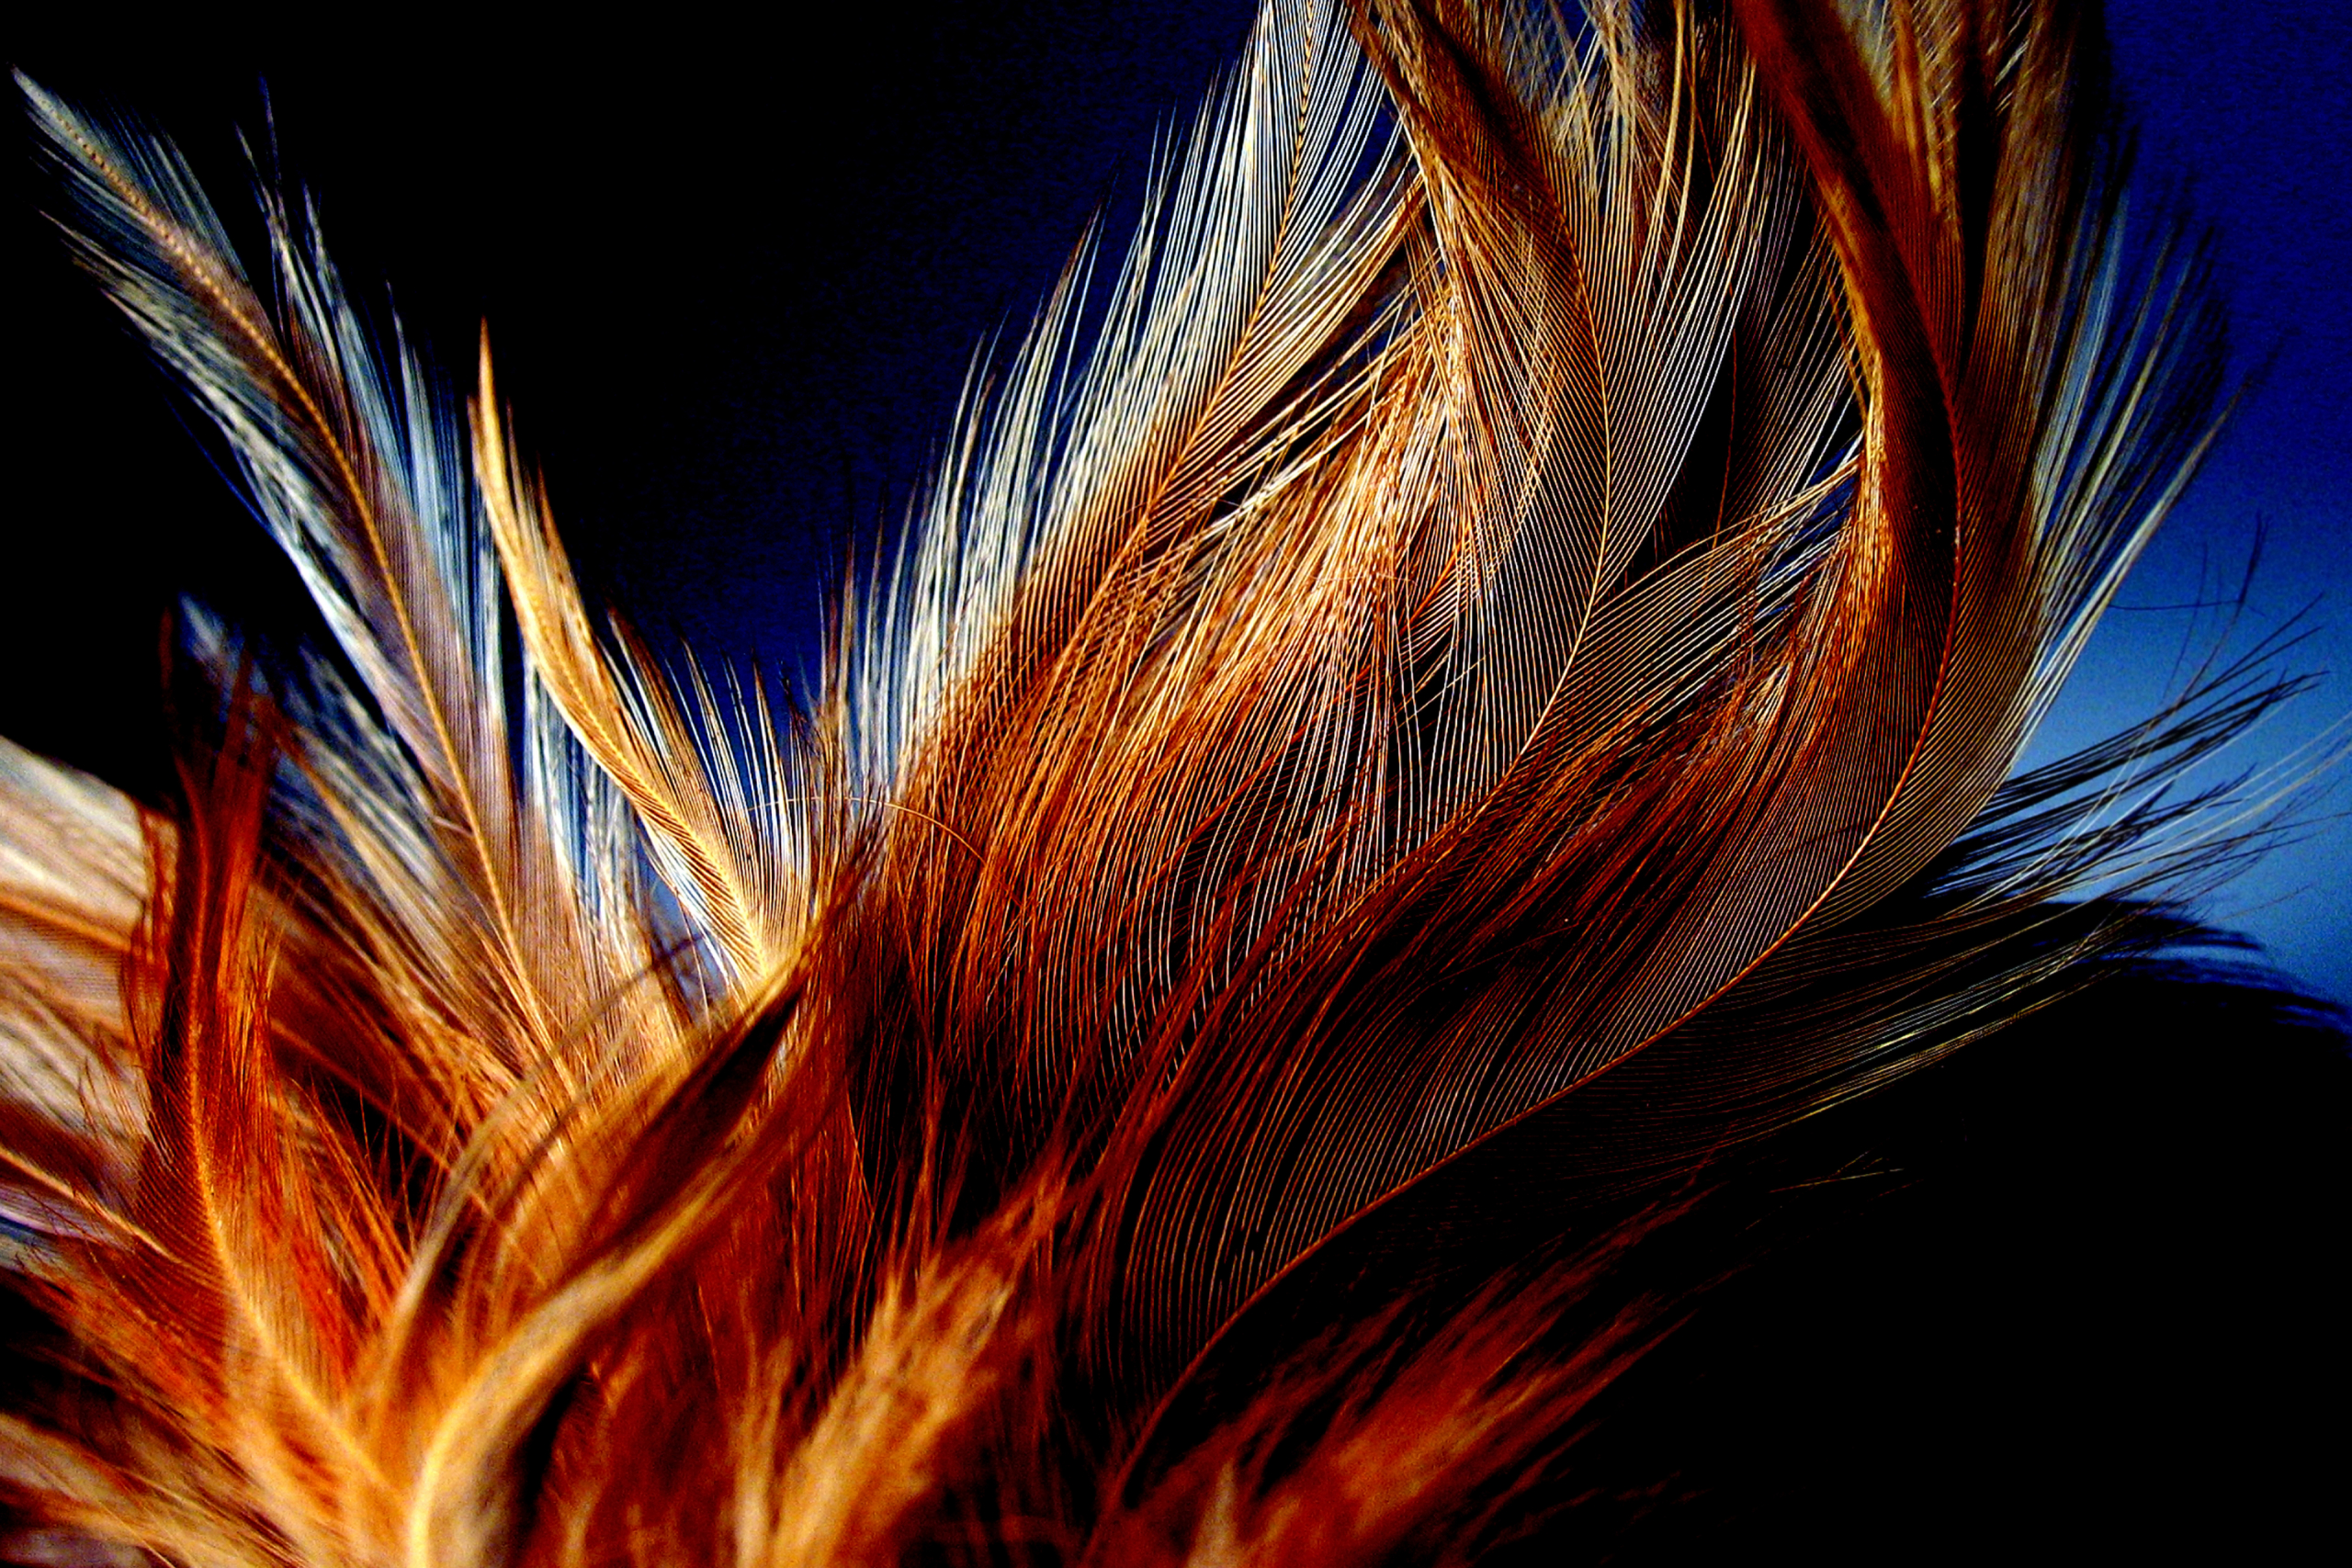 Honey Dust Feathers